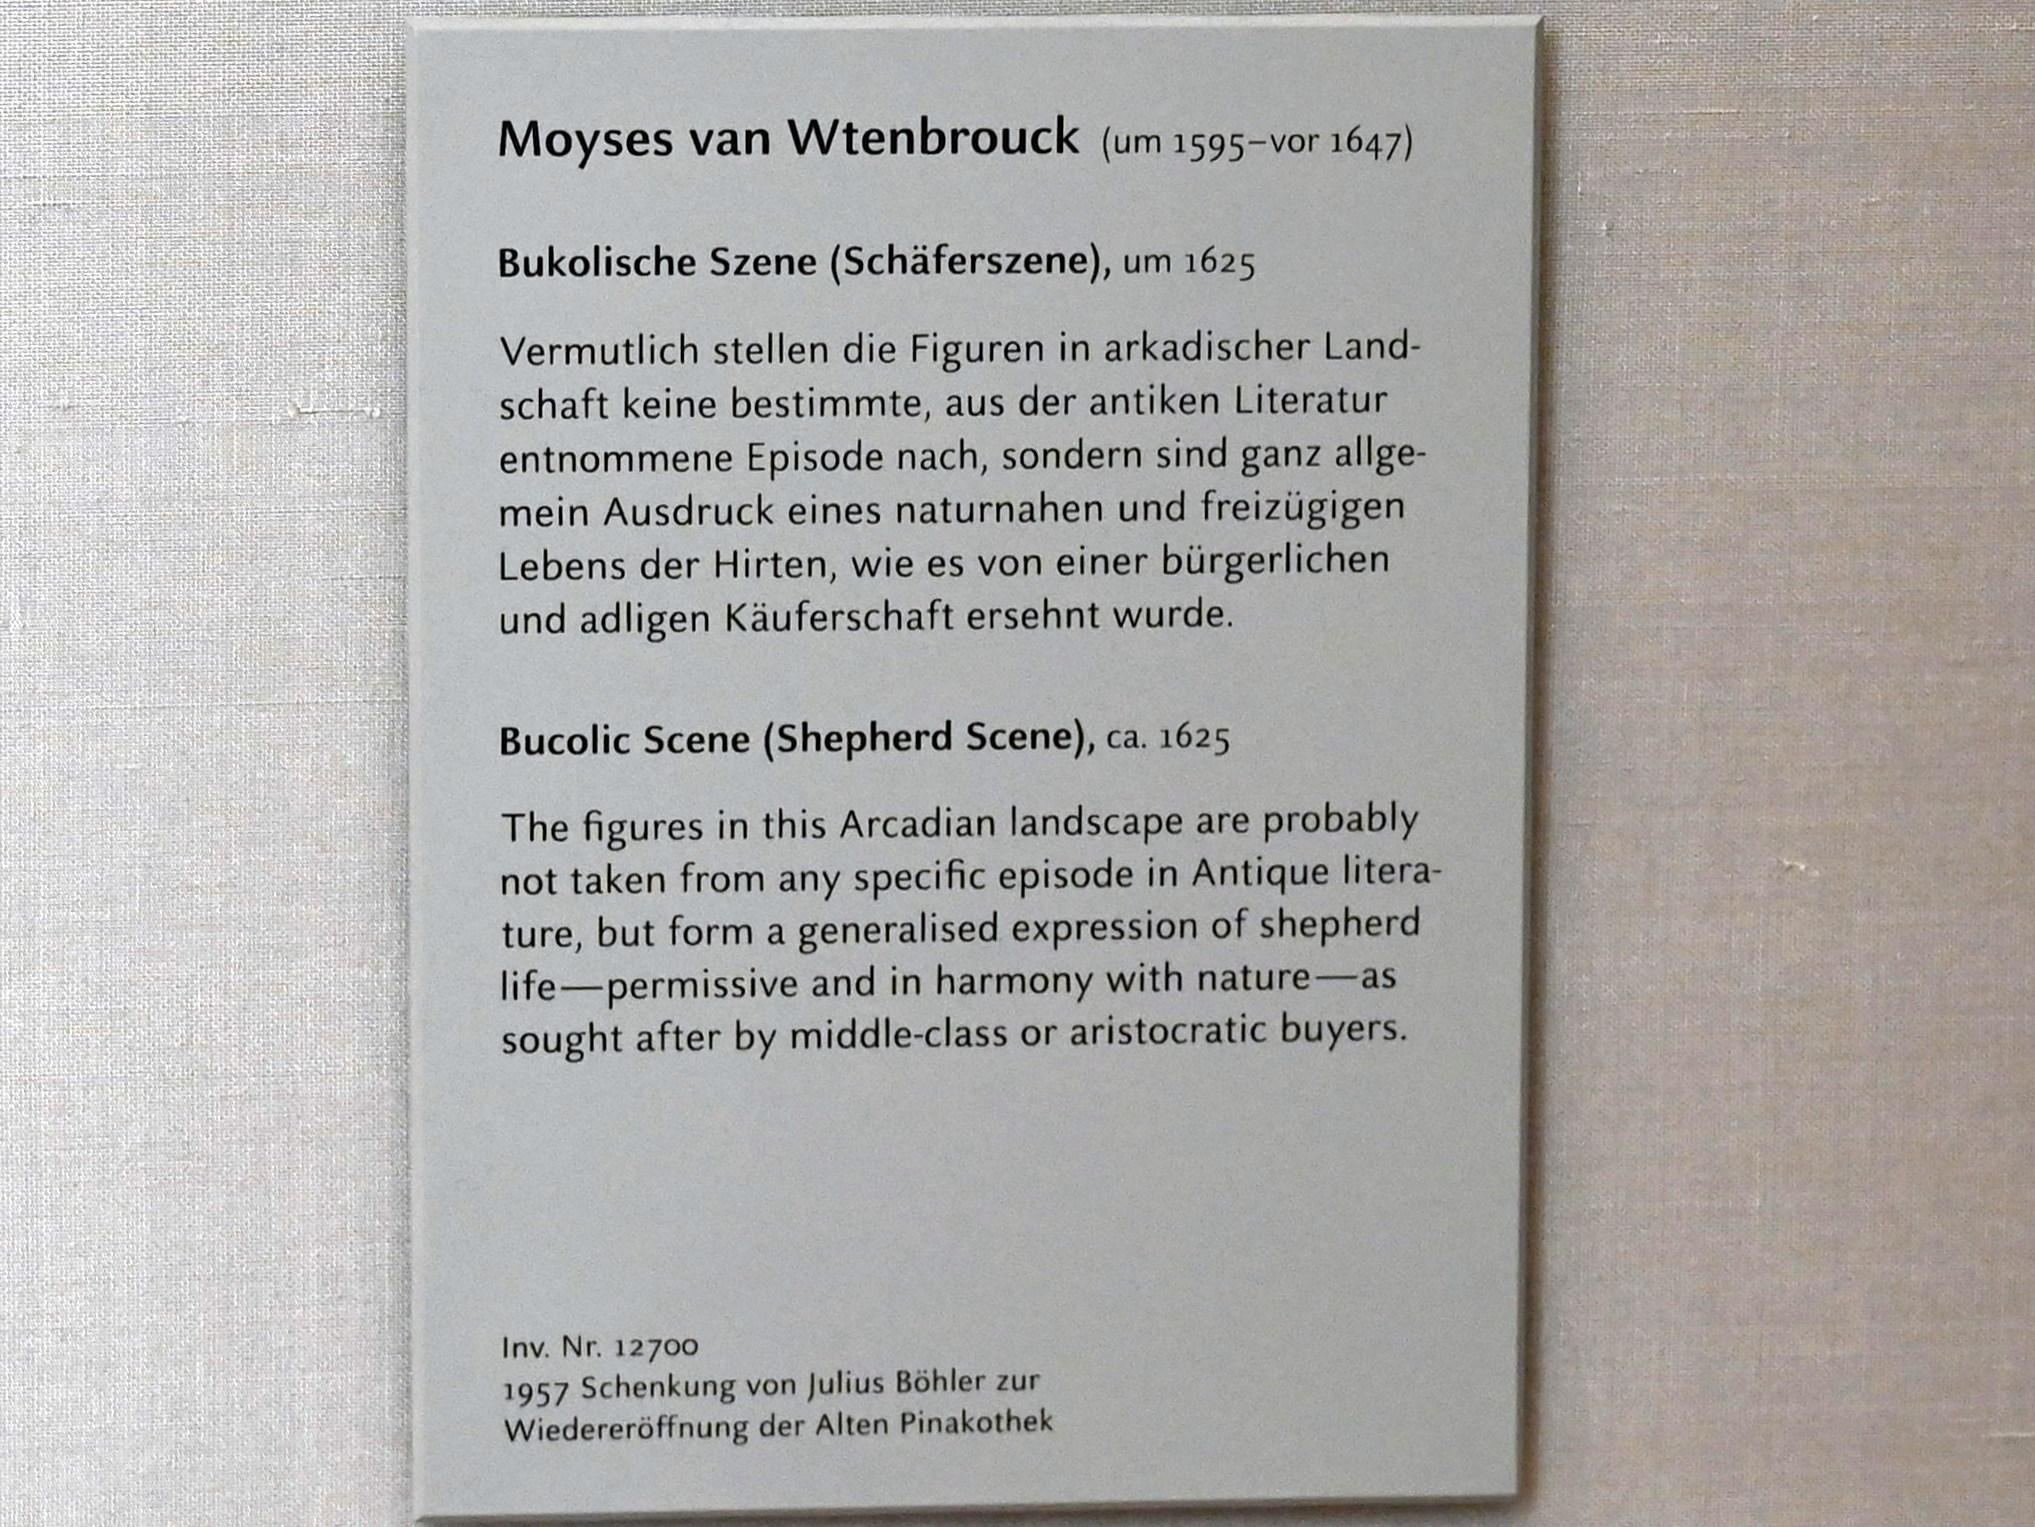 Moyses van Wtenbrouck: Bukolische Szene (Schäferszene), Undatiert, Bild 2/2